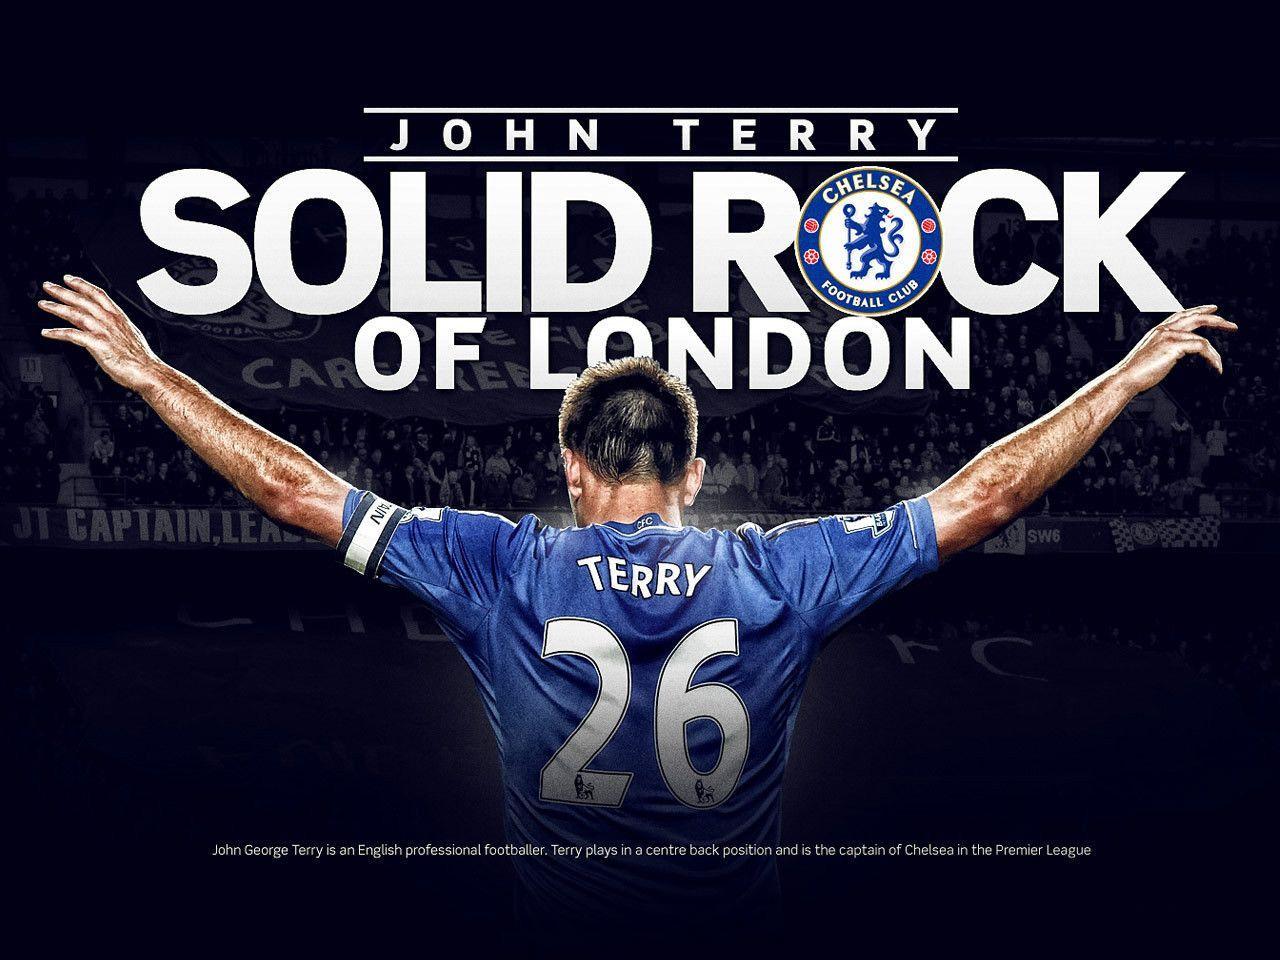 Pin by CARLTON NOBLE on LONDON TO PARIS | Pinterest | Chelsea FC ...